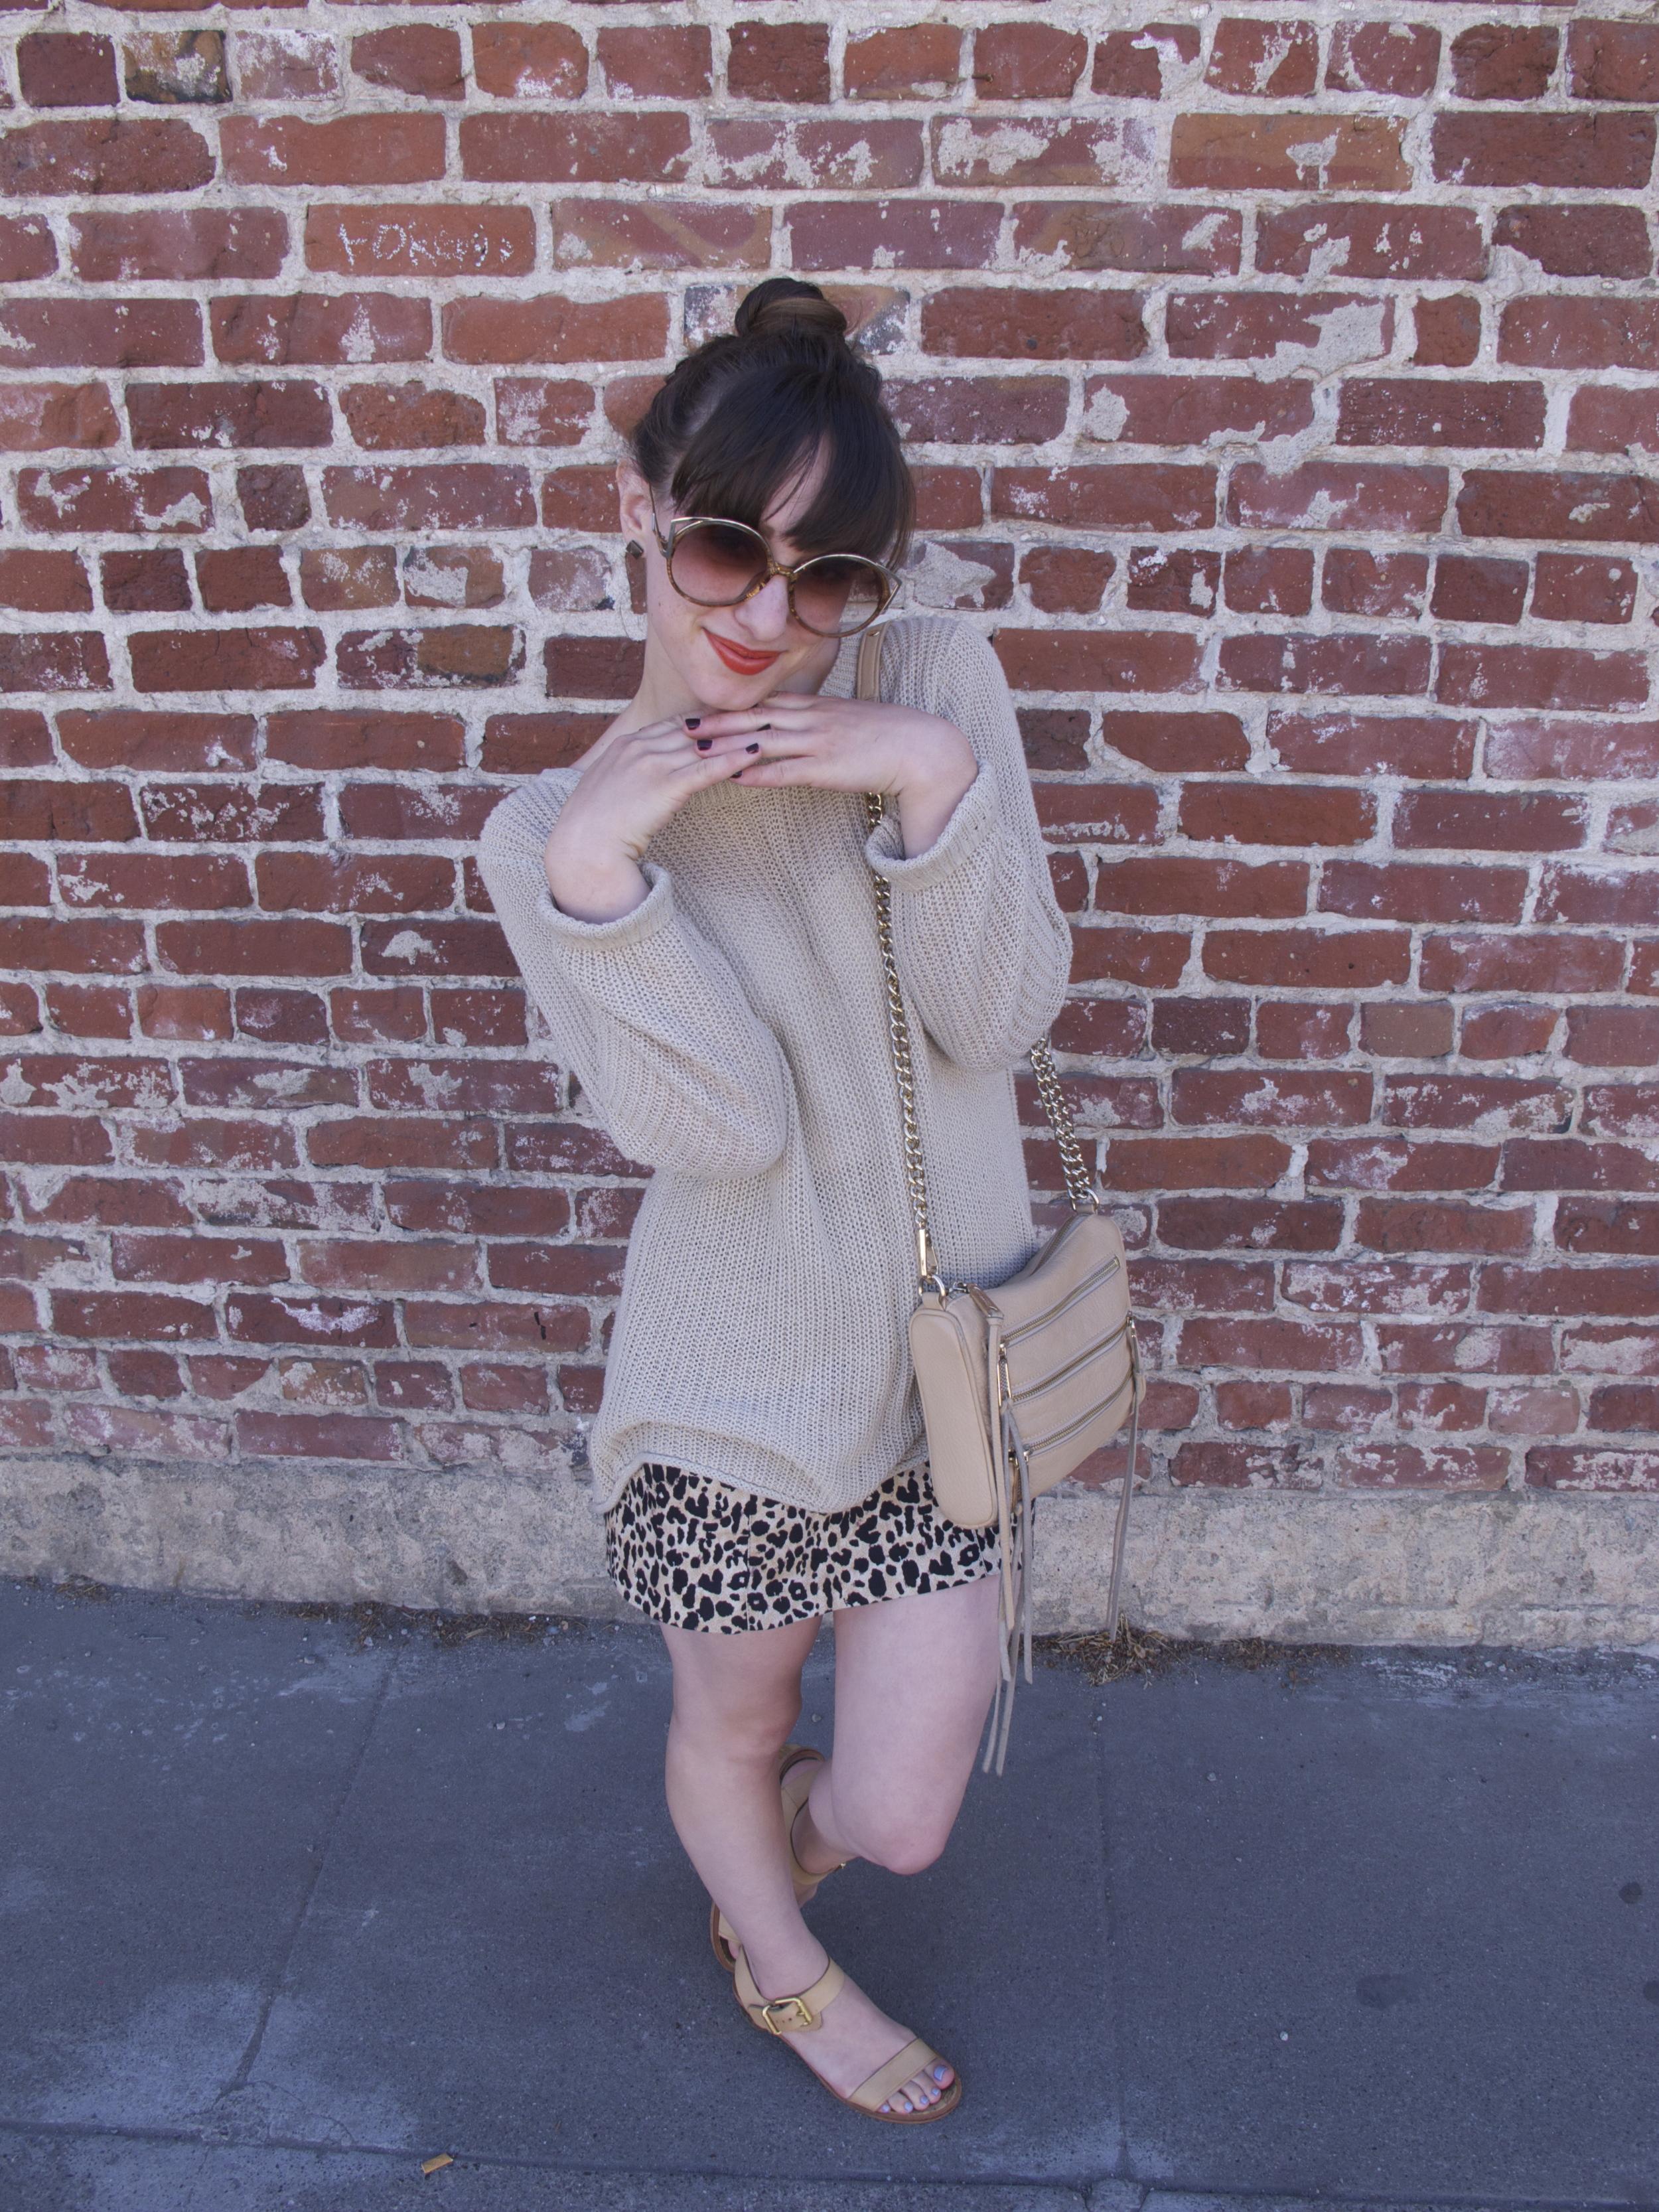 Sweater: Joie, Skirt: Forever21, Sandals: Sam Edelman, 5-Zip Mini Bag: Rebecca Minkoff, Sunglasses: Christian Dior (vintage)